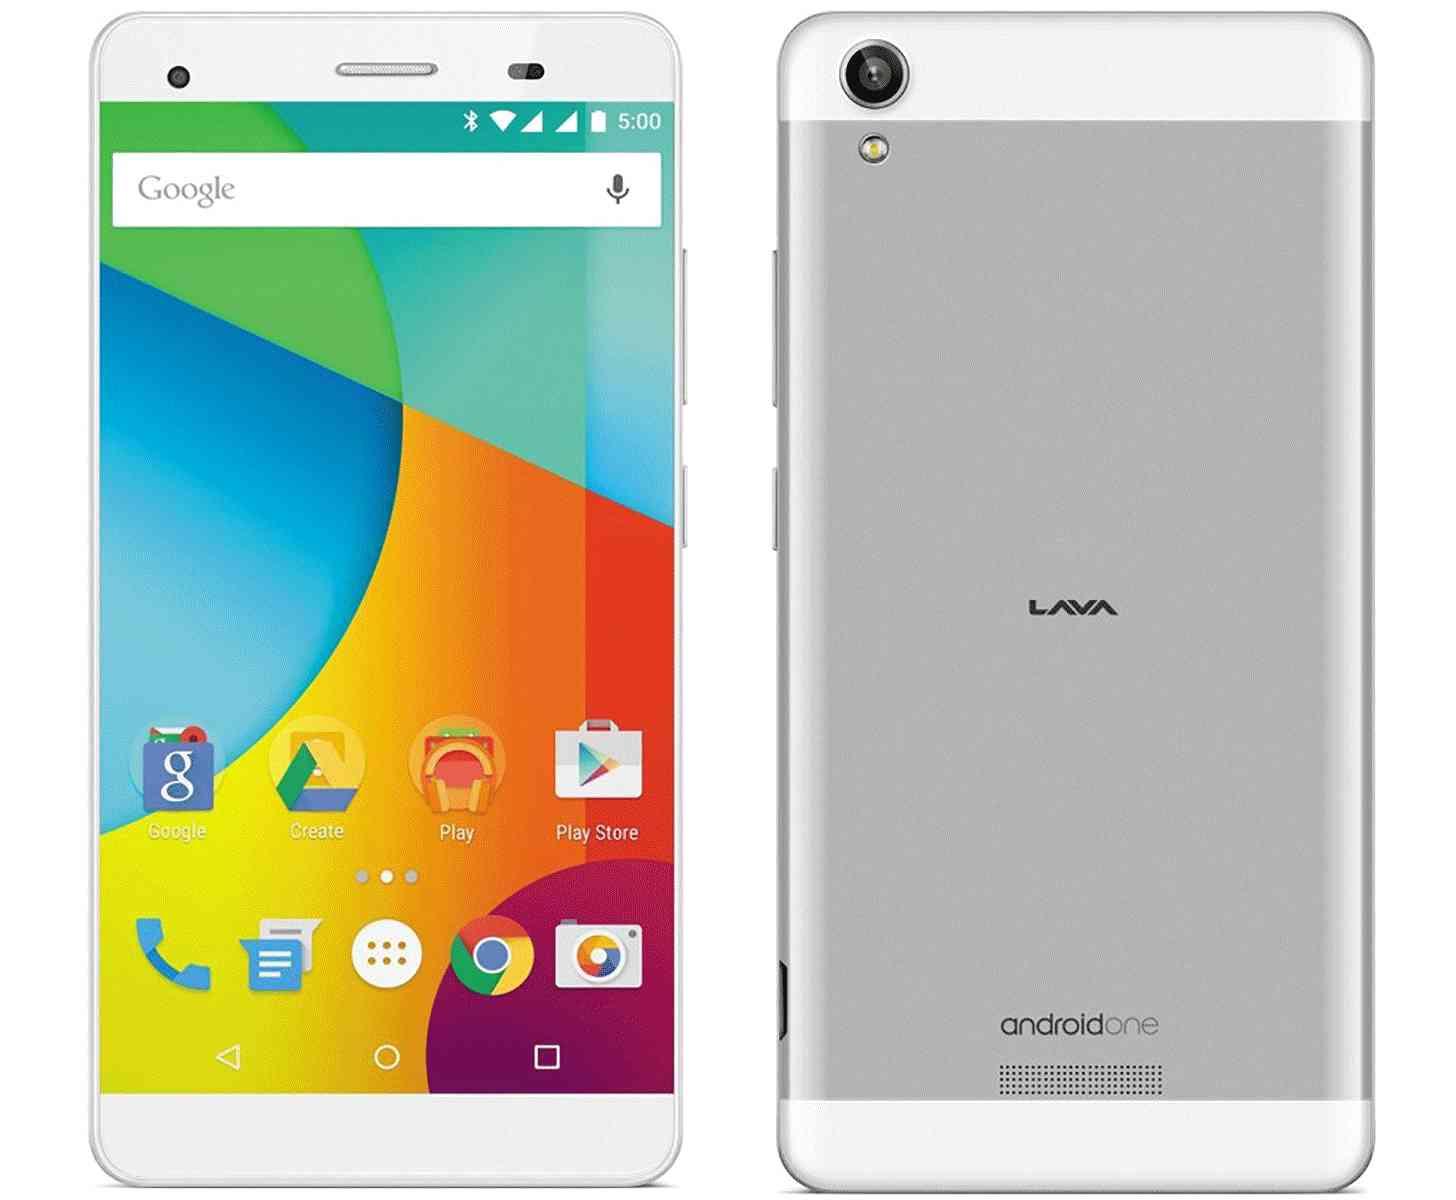 Lava Pixel V1 Android One leak large